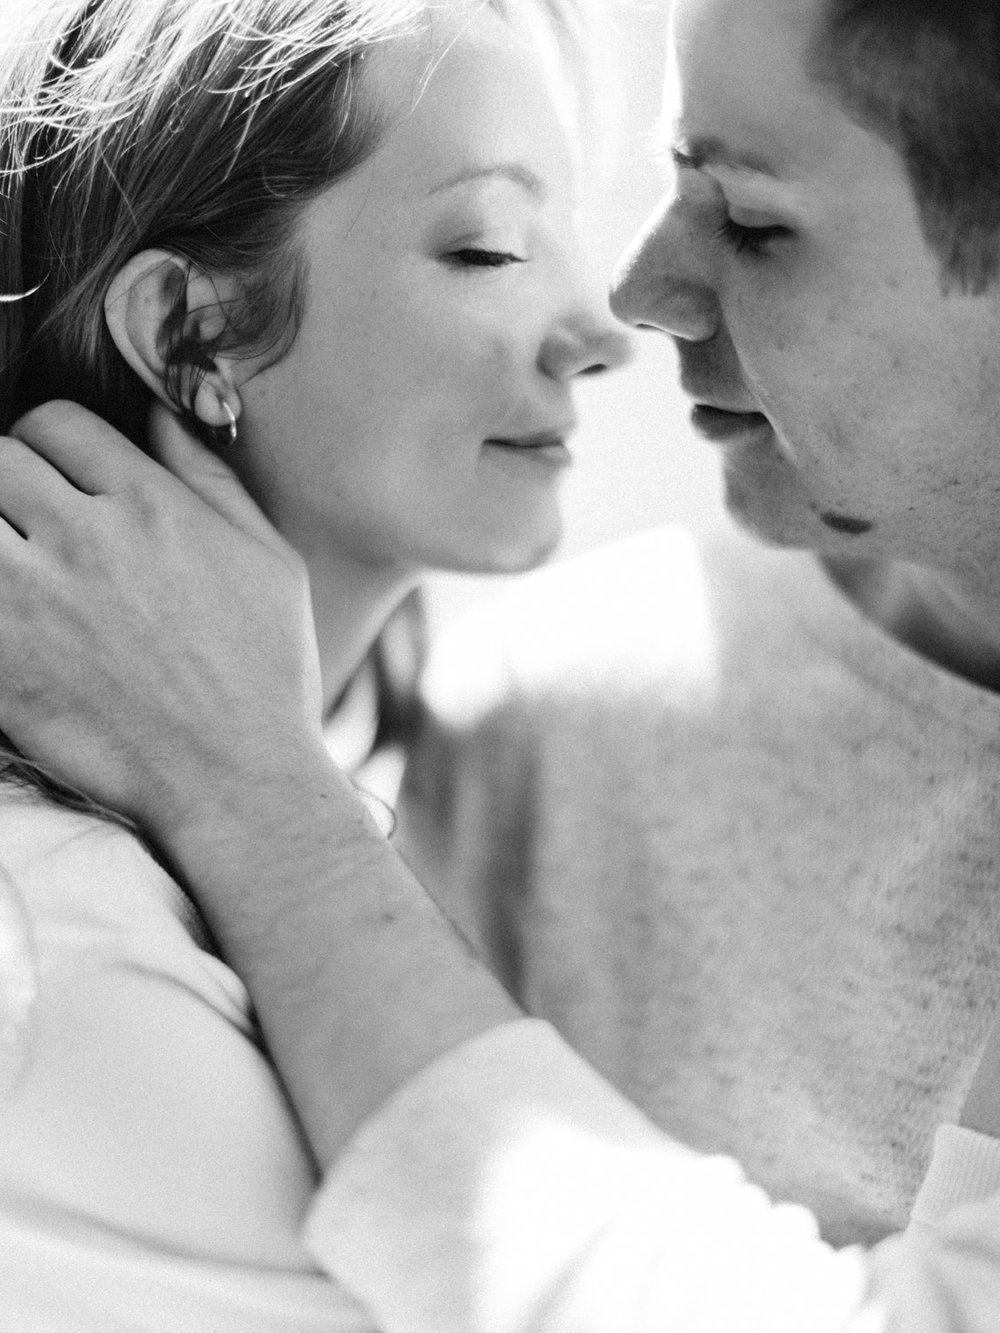 toronto-collingwood-wedding-photographer-at-home-engagement-inspiration 2018-222.jpg